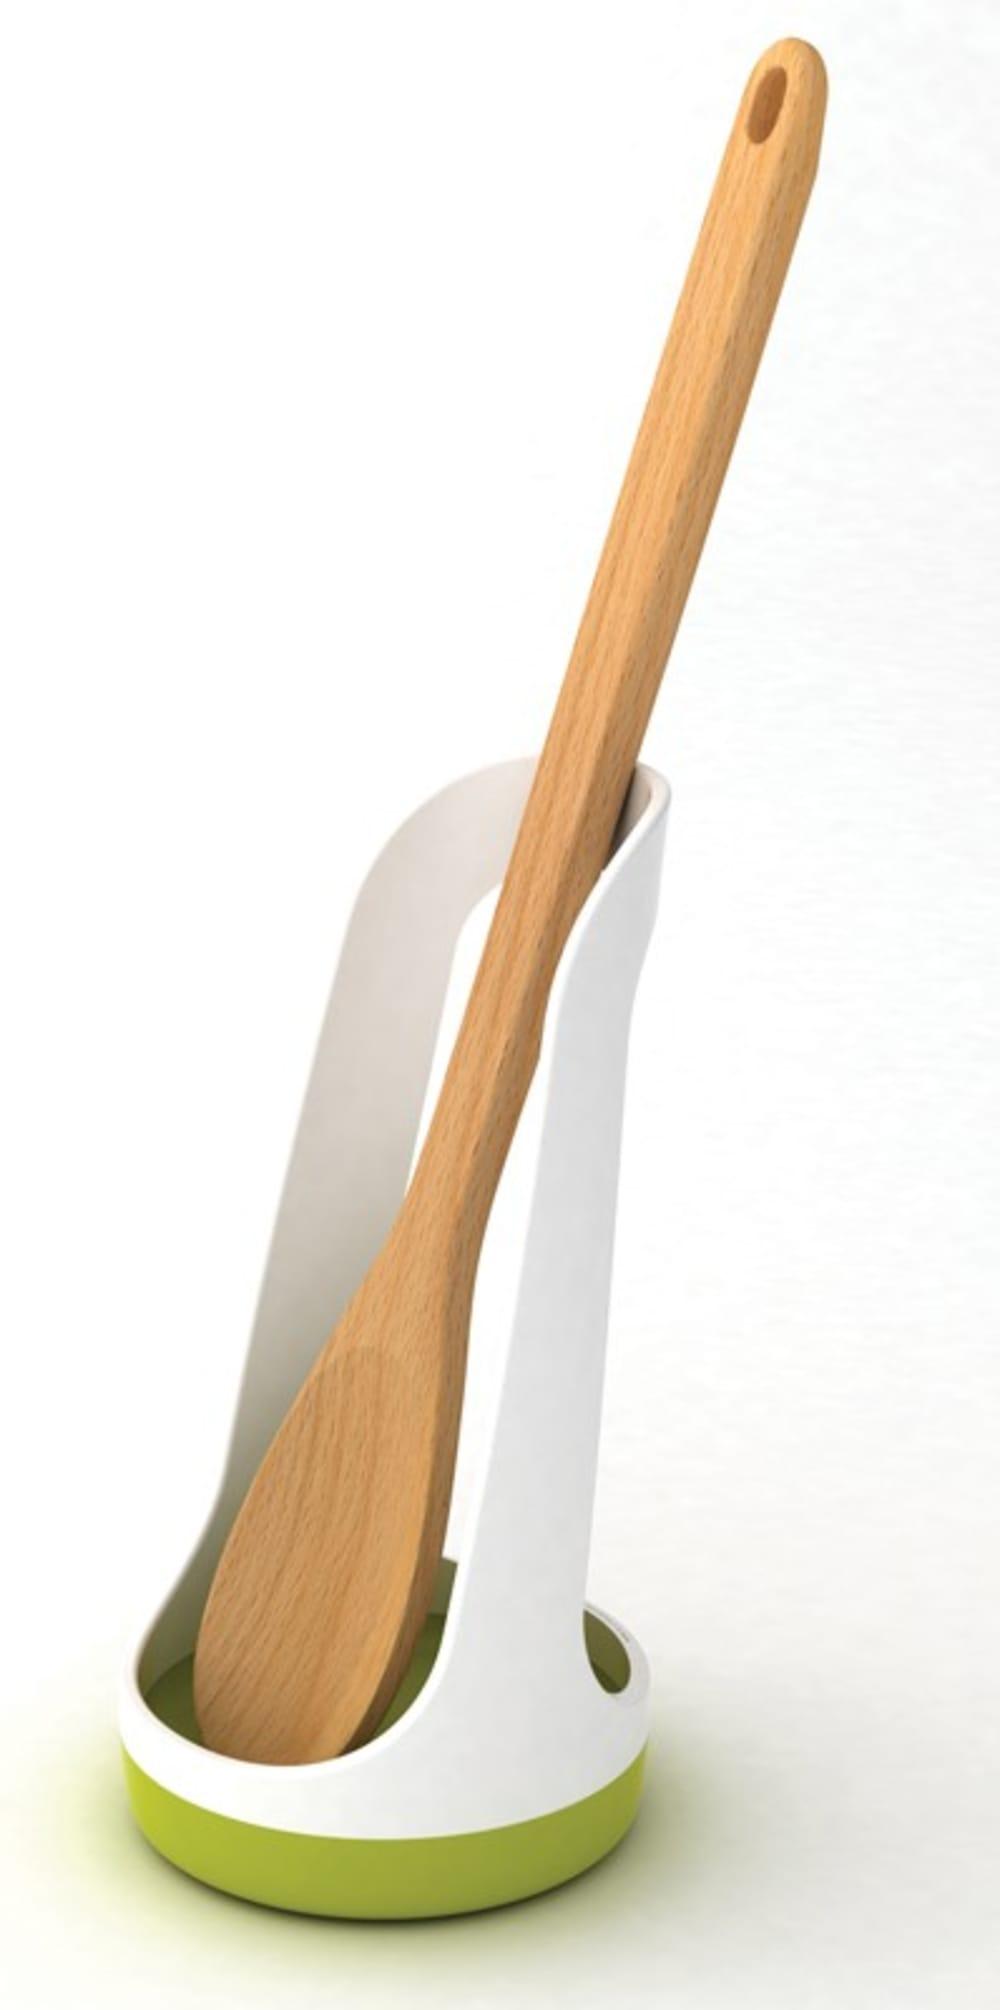 Podstawka na łyżkę SPOONBASE biało-zielona JOSEPH JOSEPH